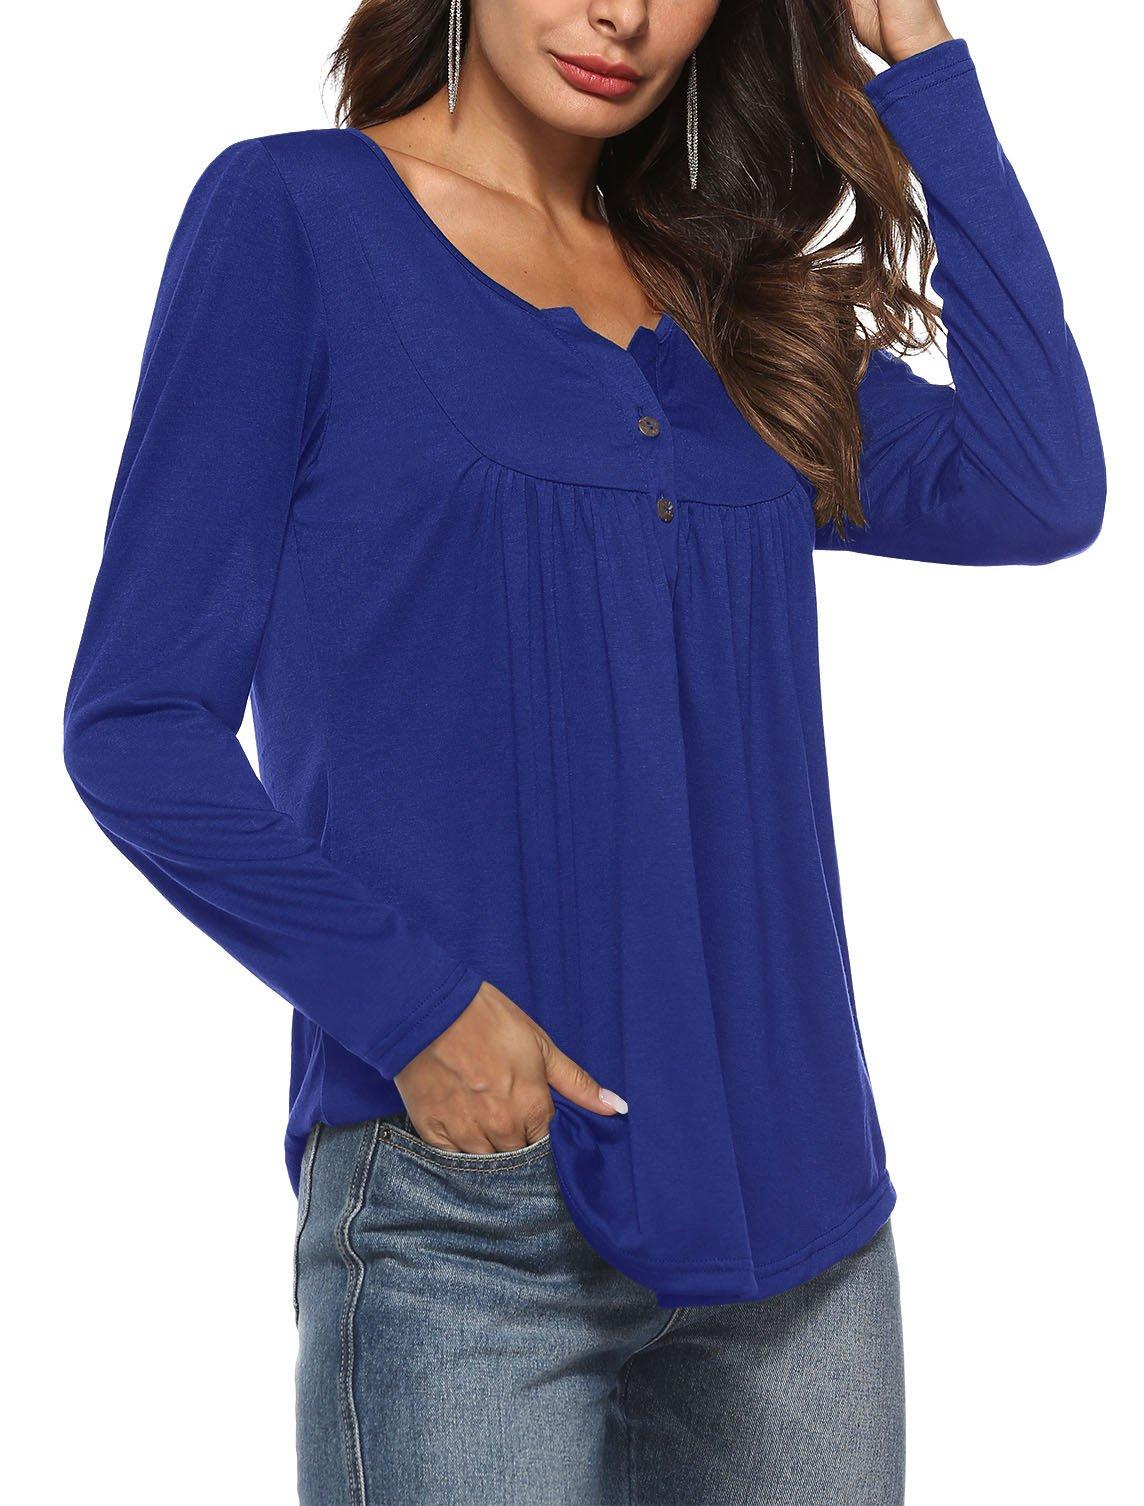 JoYang Womens Long Sleeve Comfy V Neck Loose Casual Button Down Shirts Blue XL